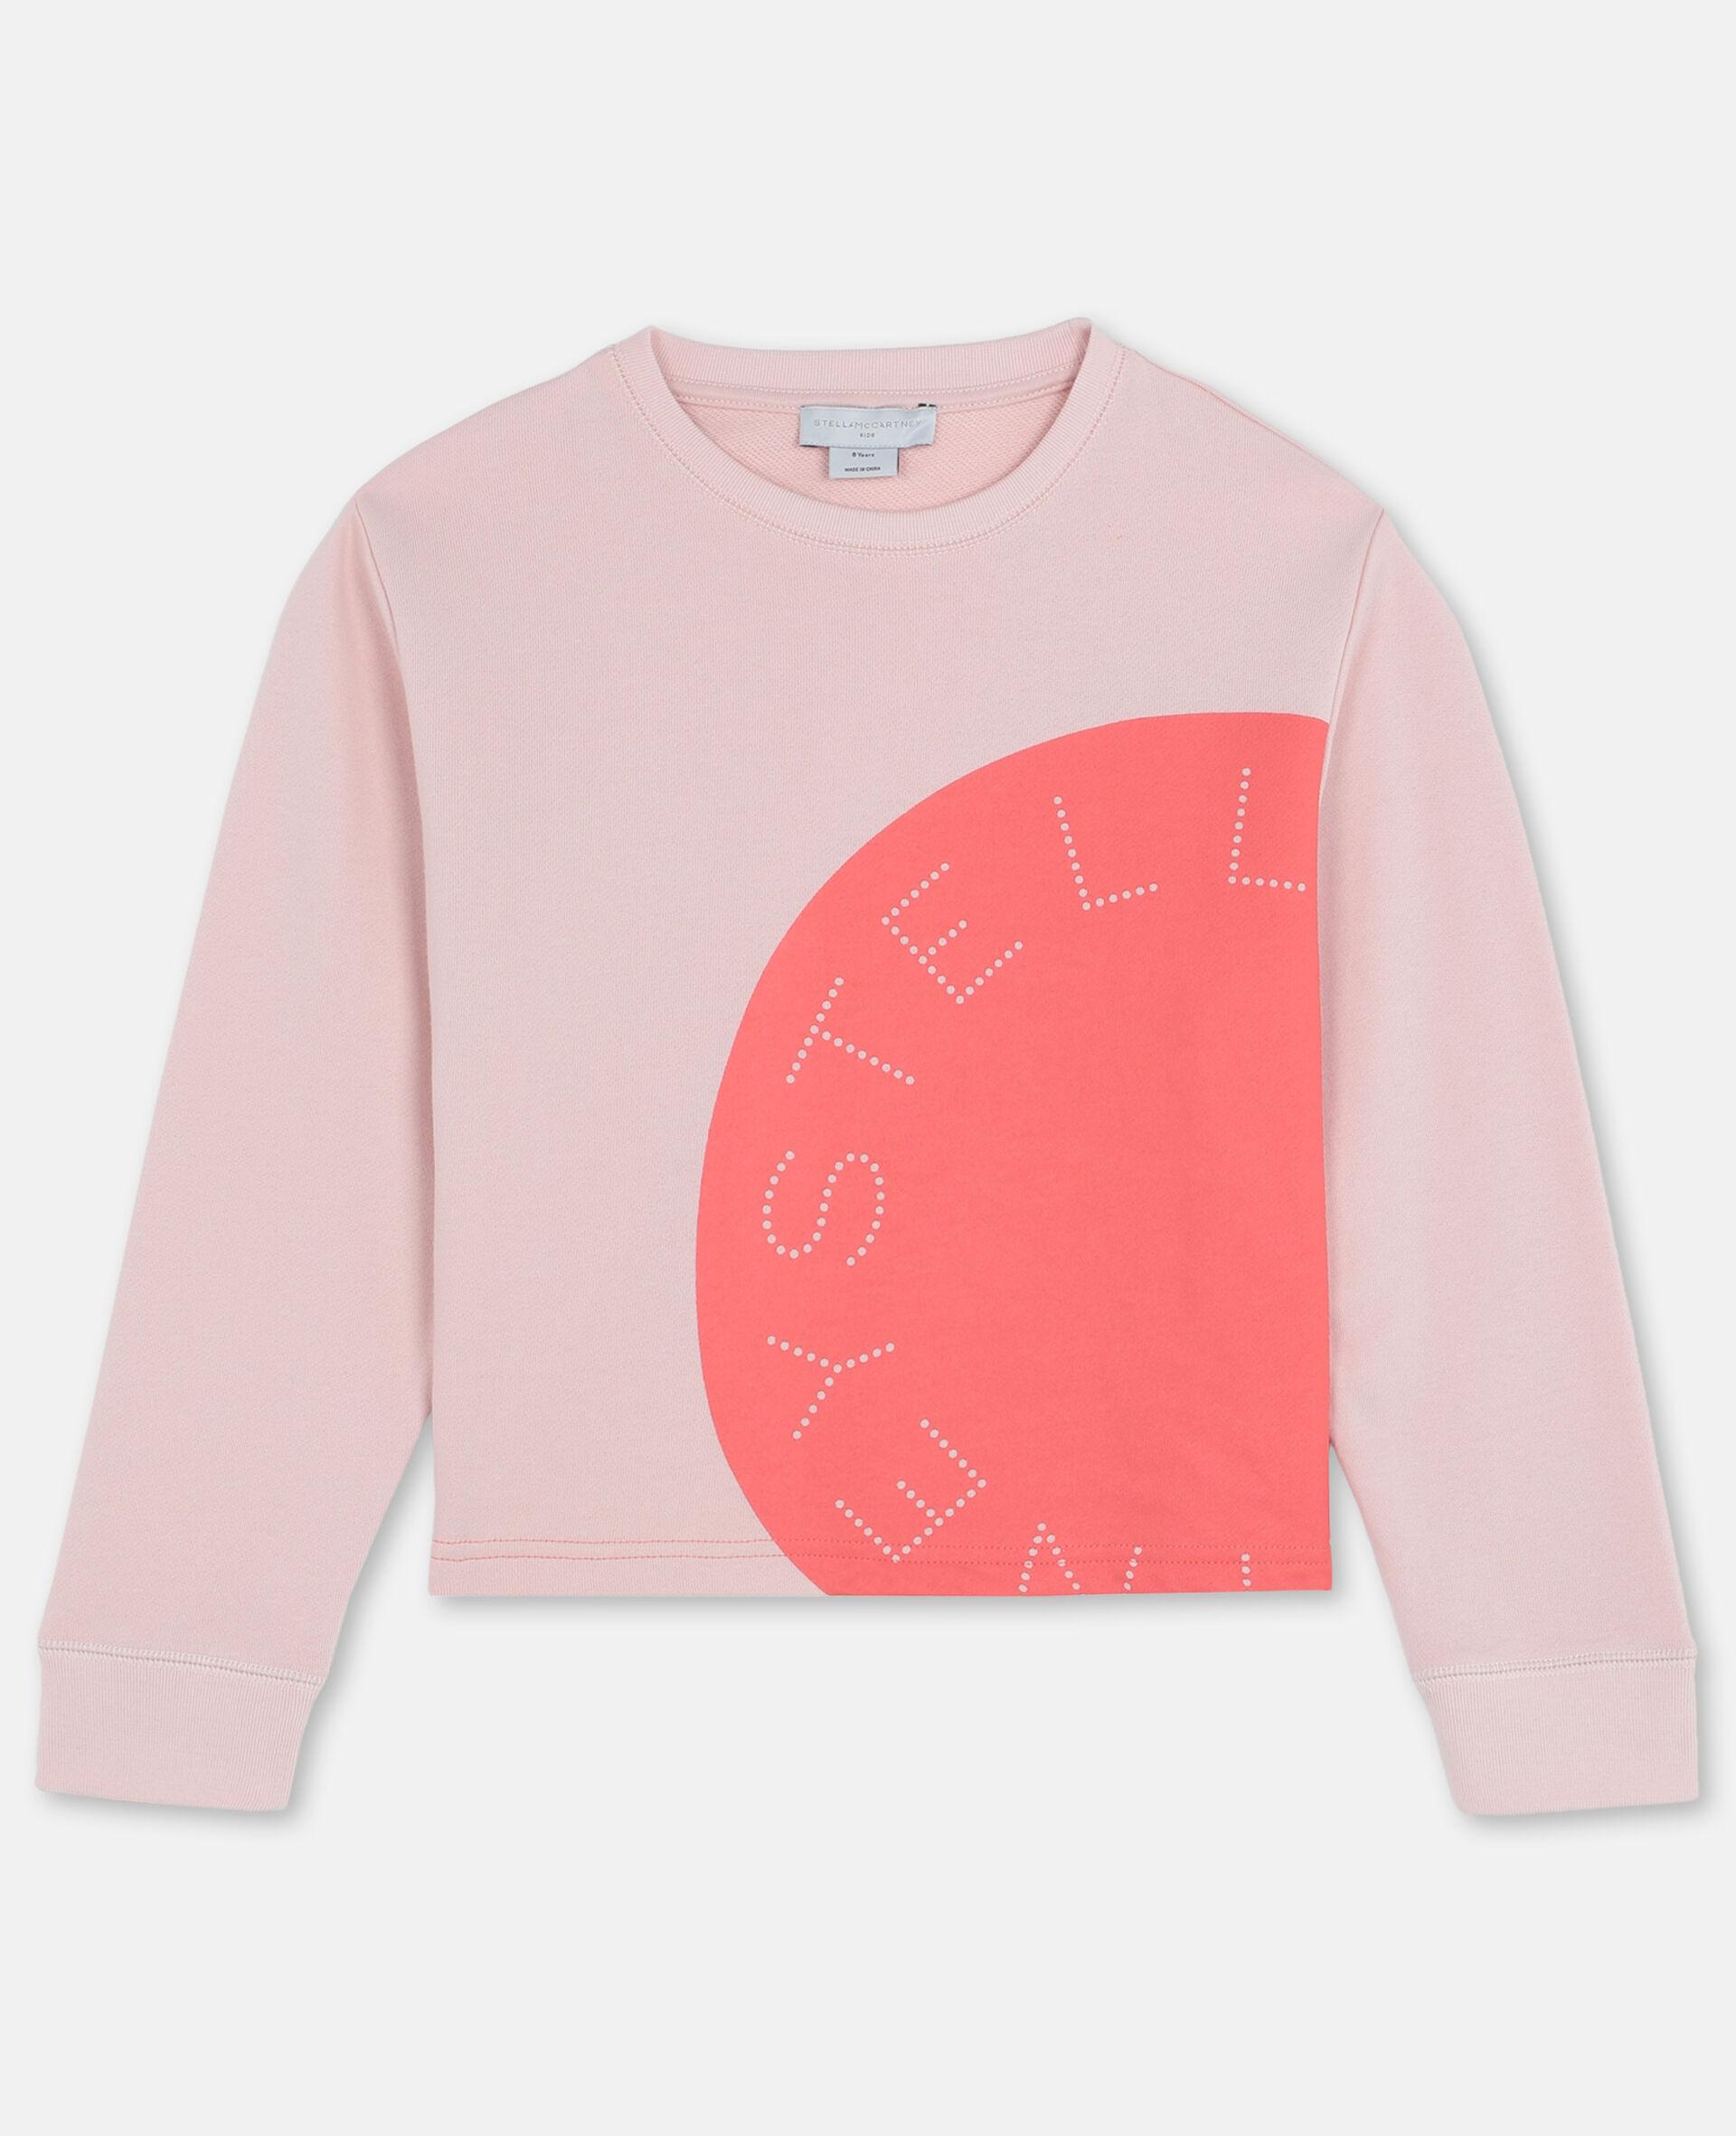 Sportliches Baumwollfleece-Sweatshirt mit Logo-Rose-large image number 0